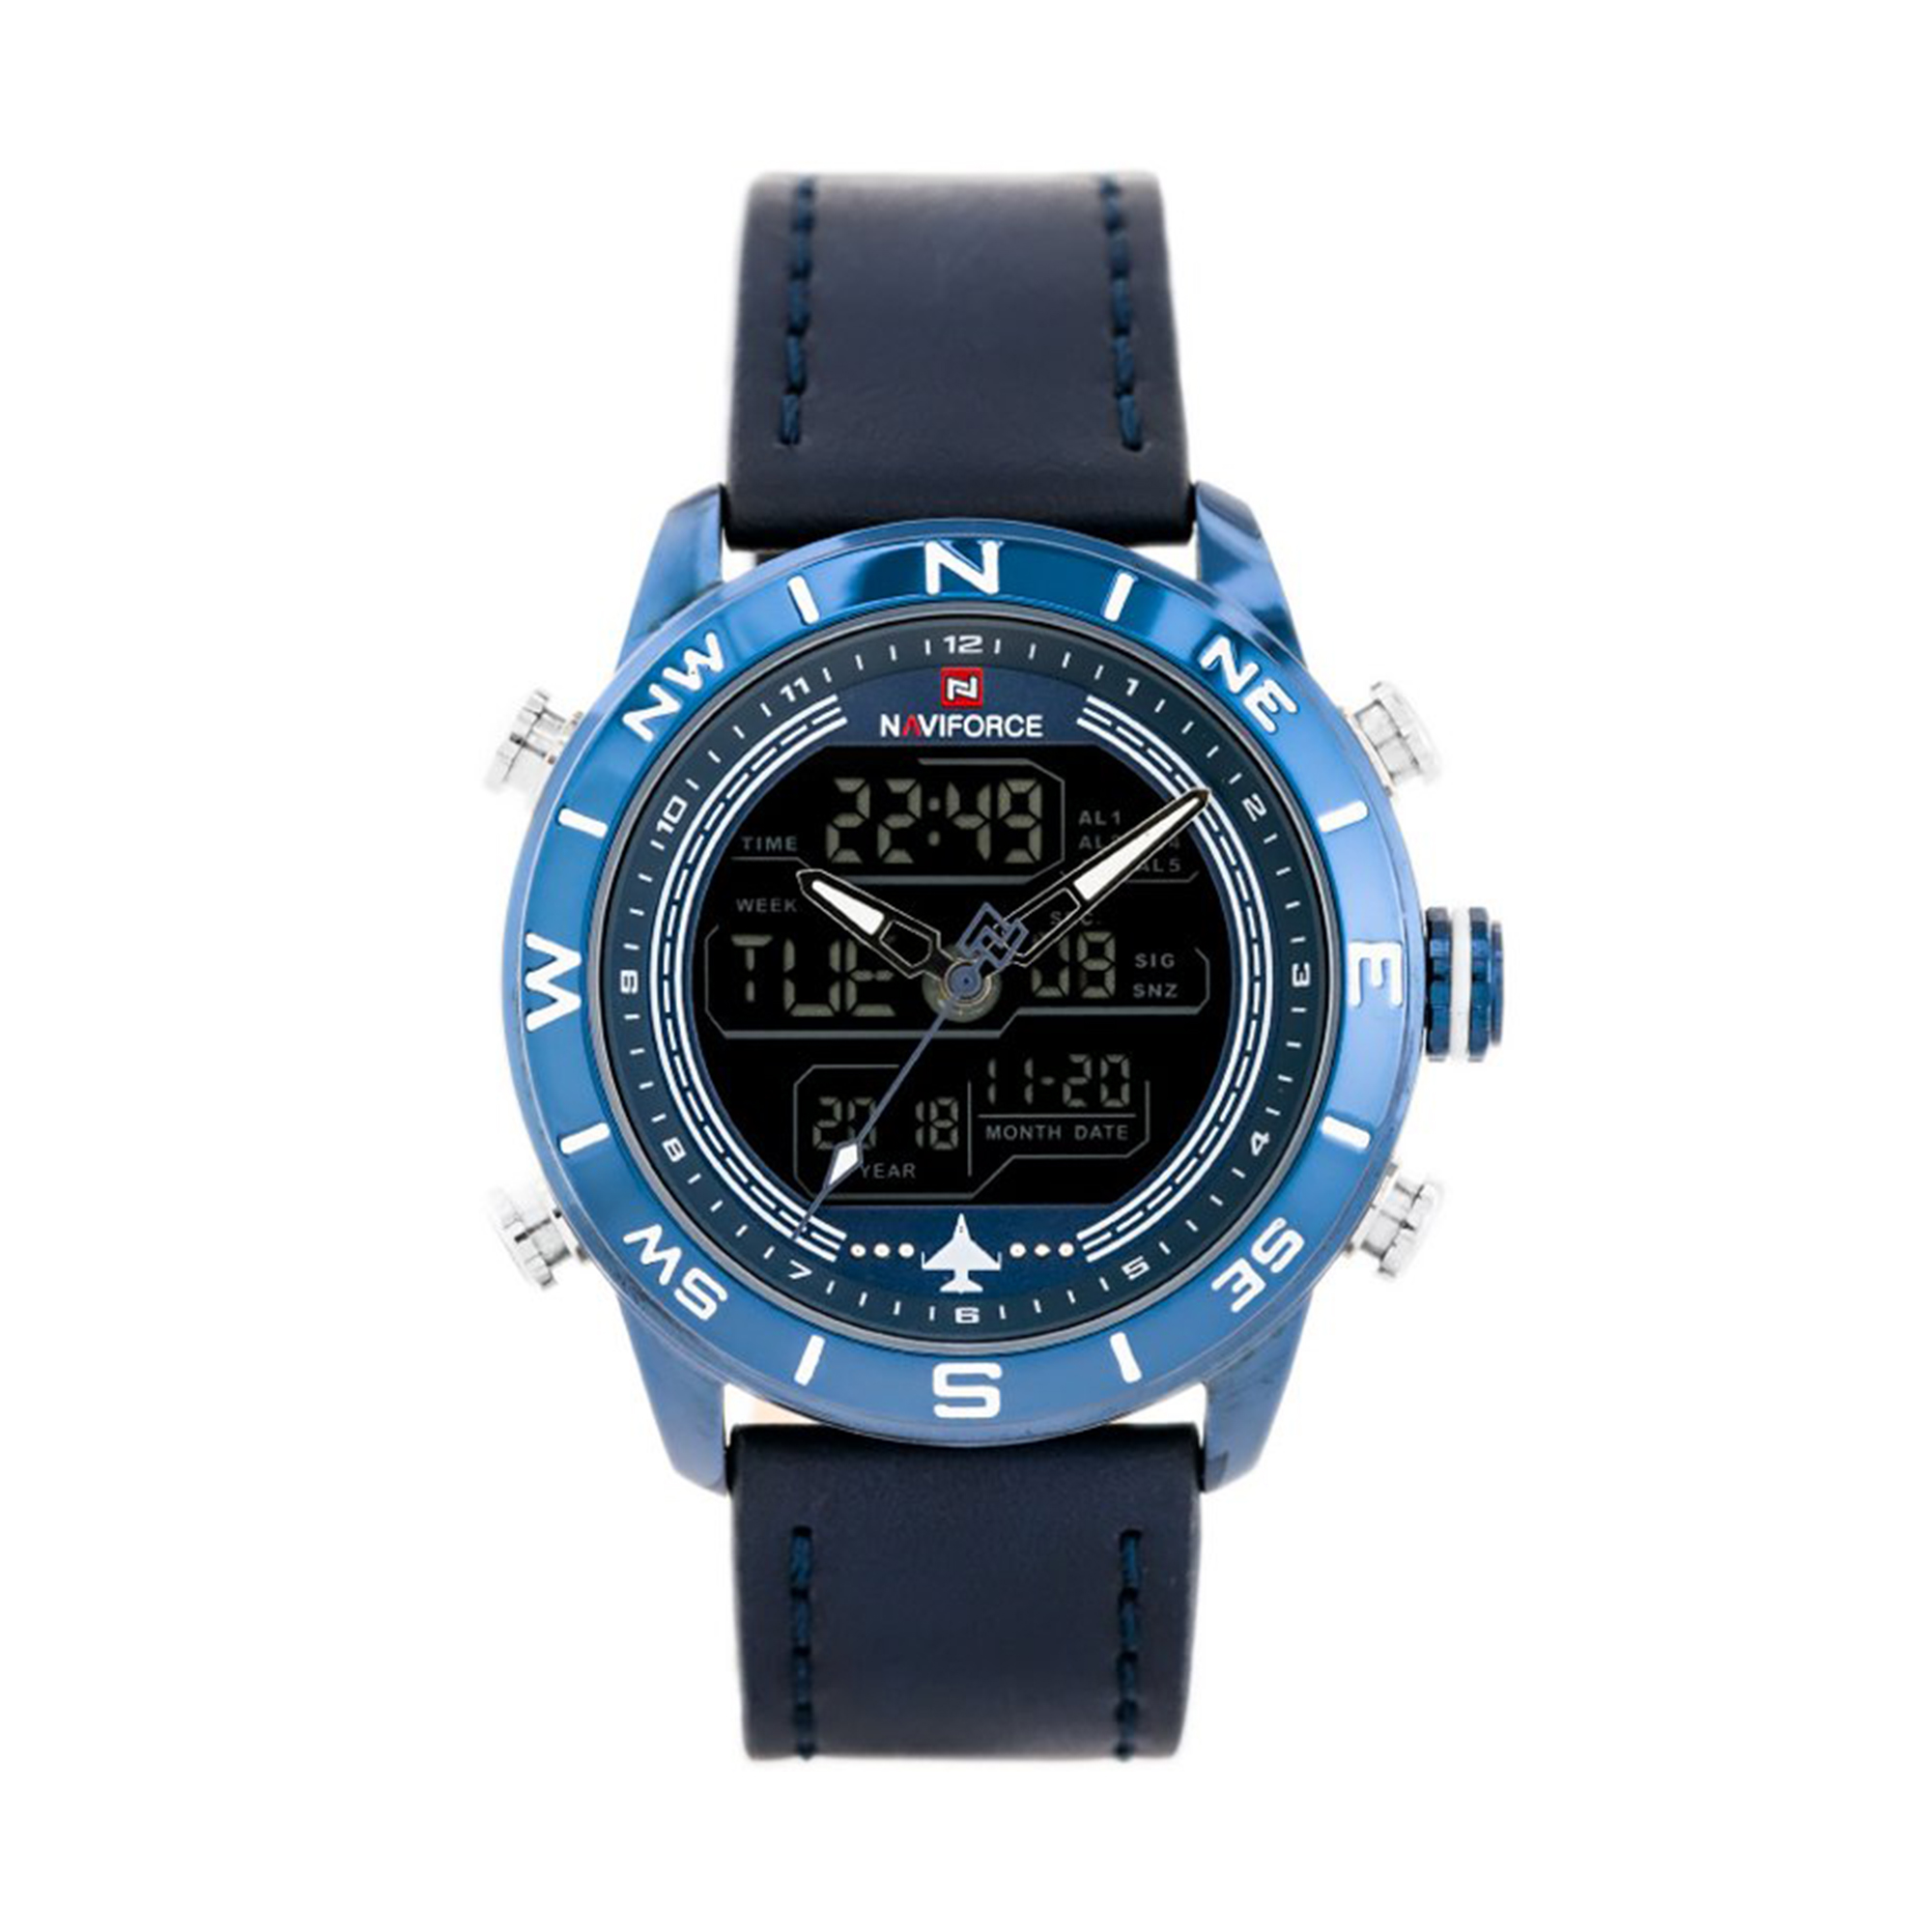 ساعت مچی دیجیتال مردانه نیوی فورس مدل NF9144 BEBEBE